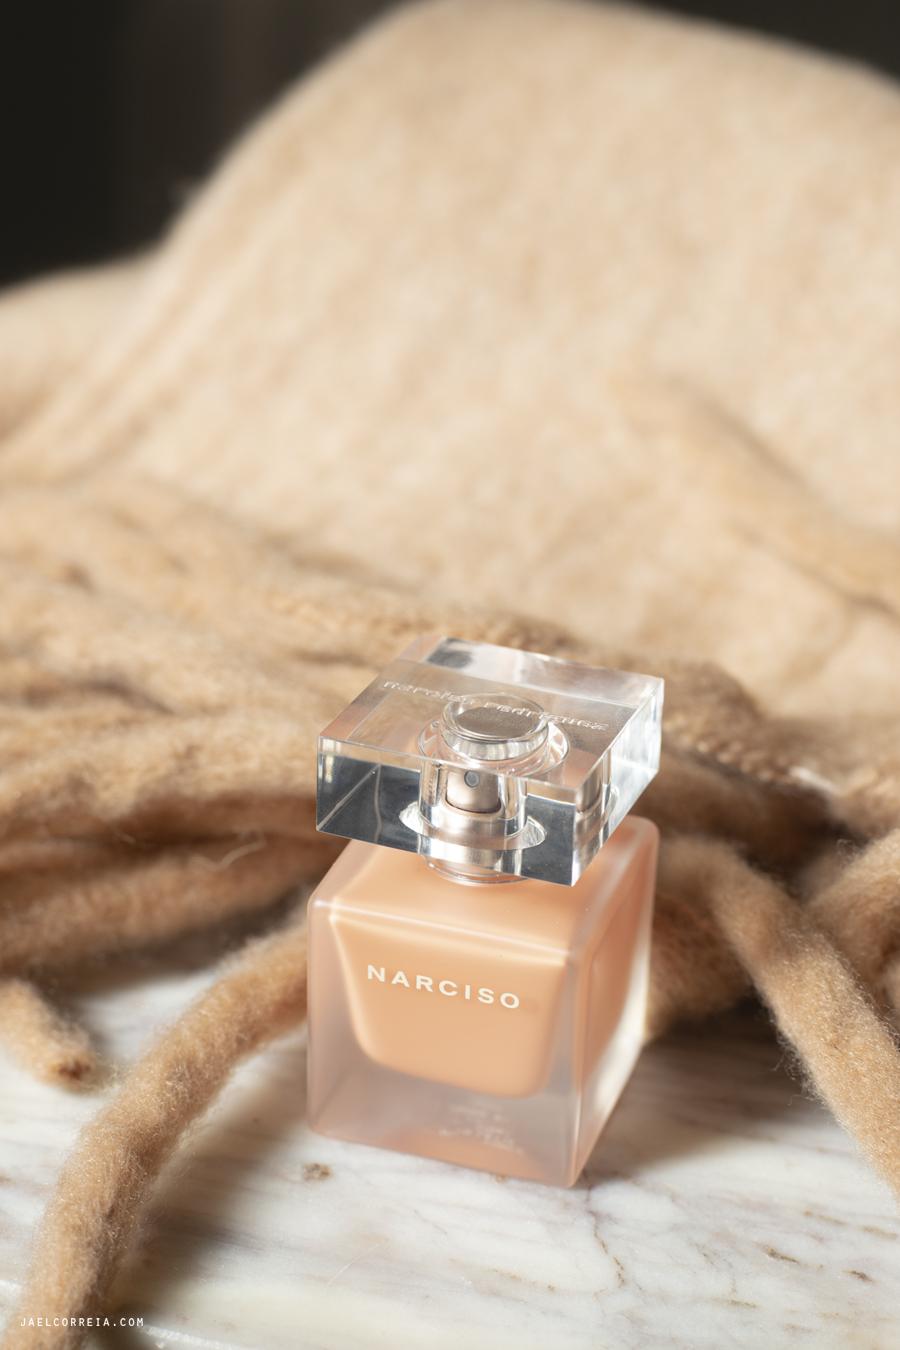 Narciso Eau Néroli Ambrée Eau de Toilette para mulheres notino pt loja online perfumes baratos perfumaria jael correia portugal parfum eau